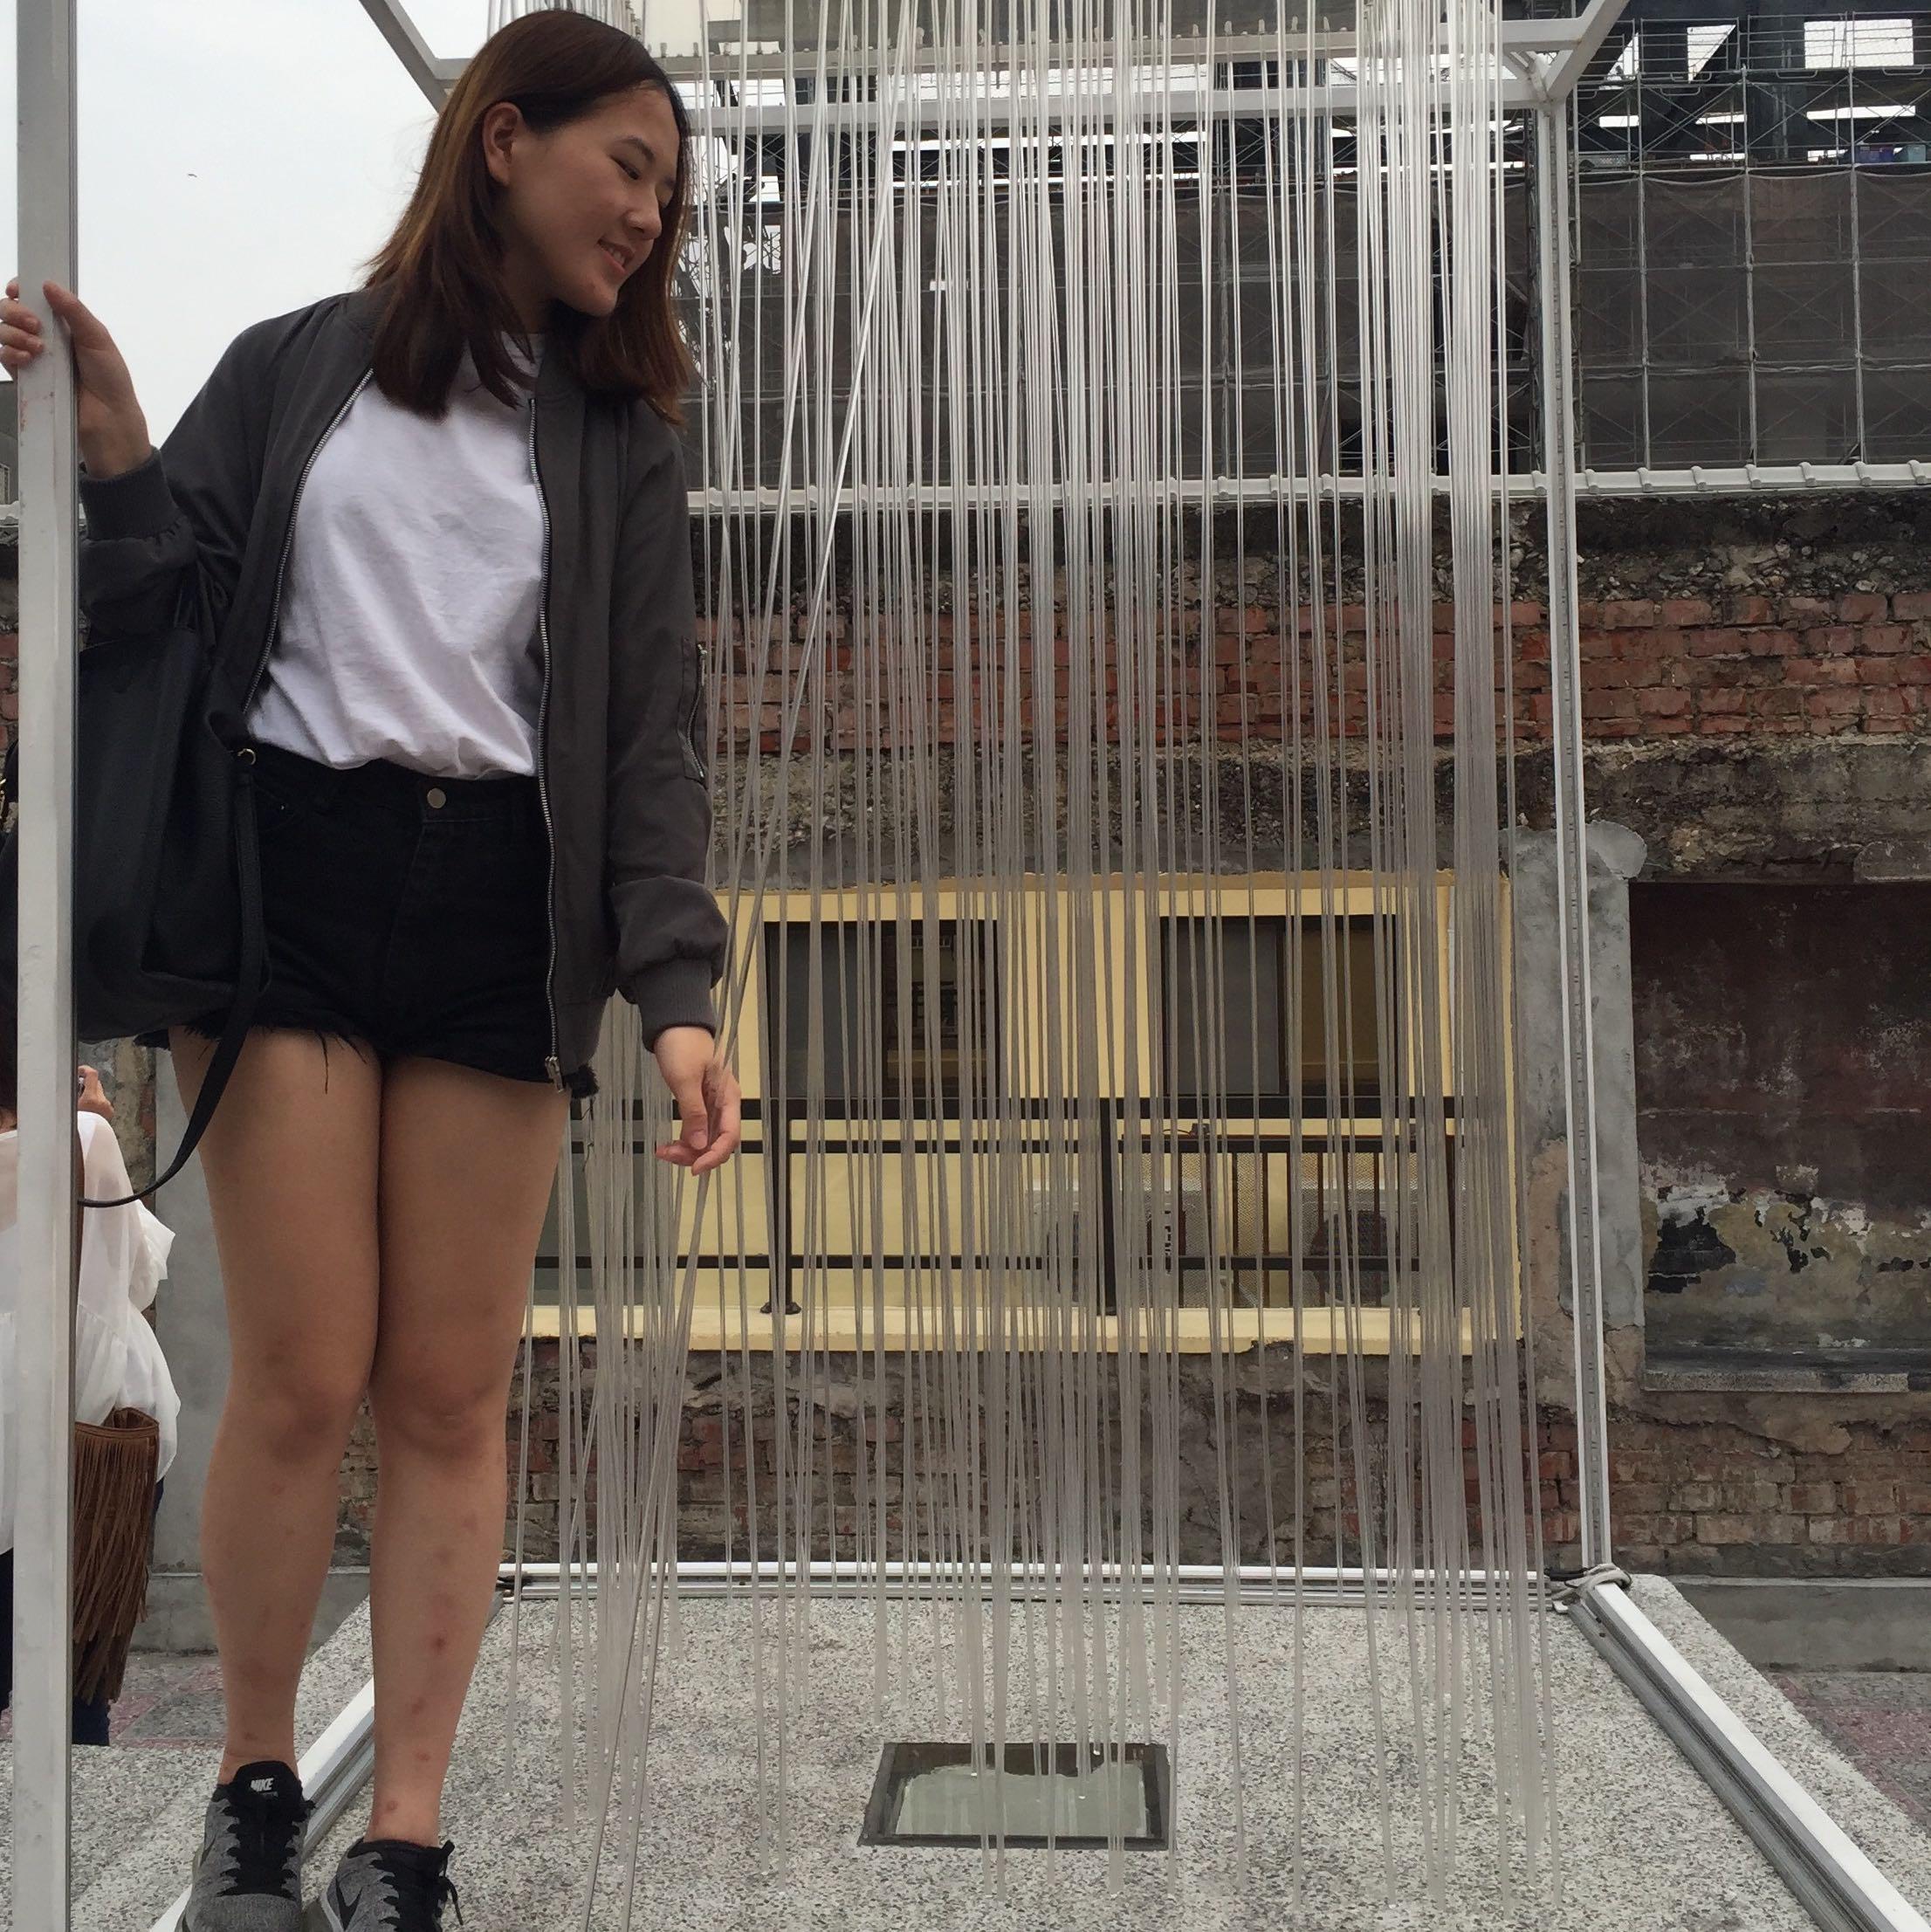 xinyi___